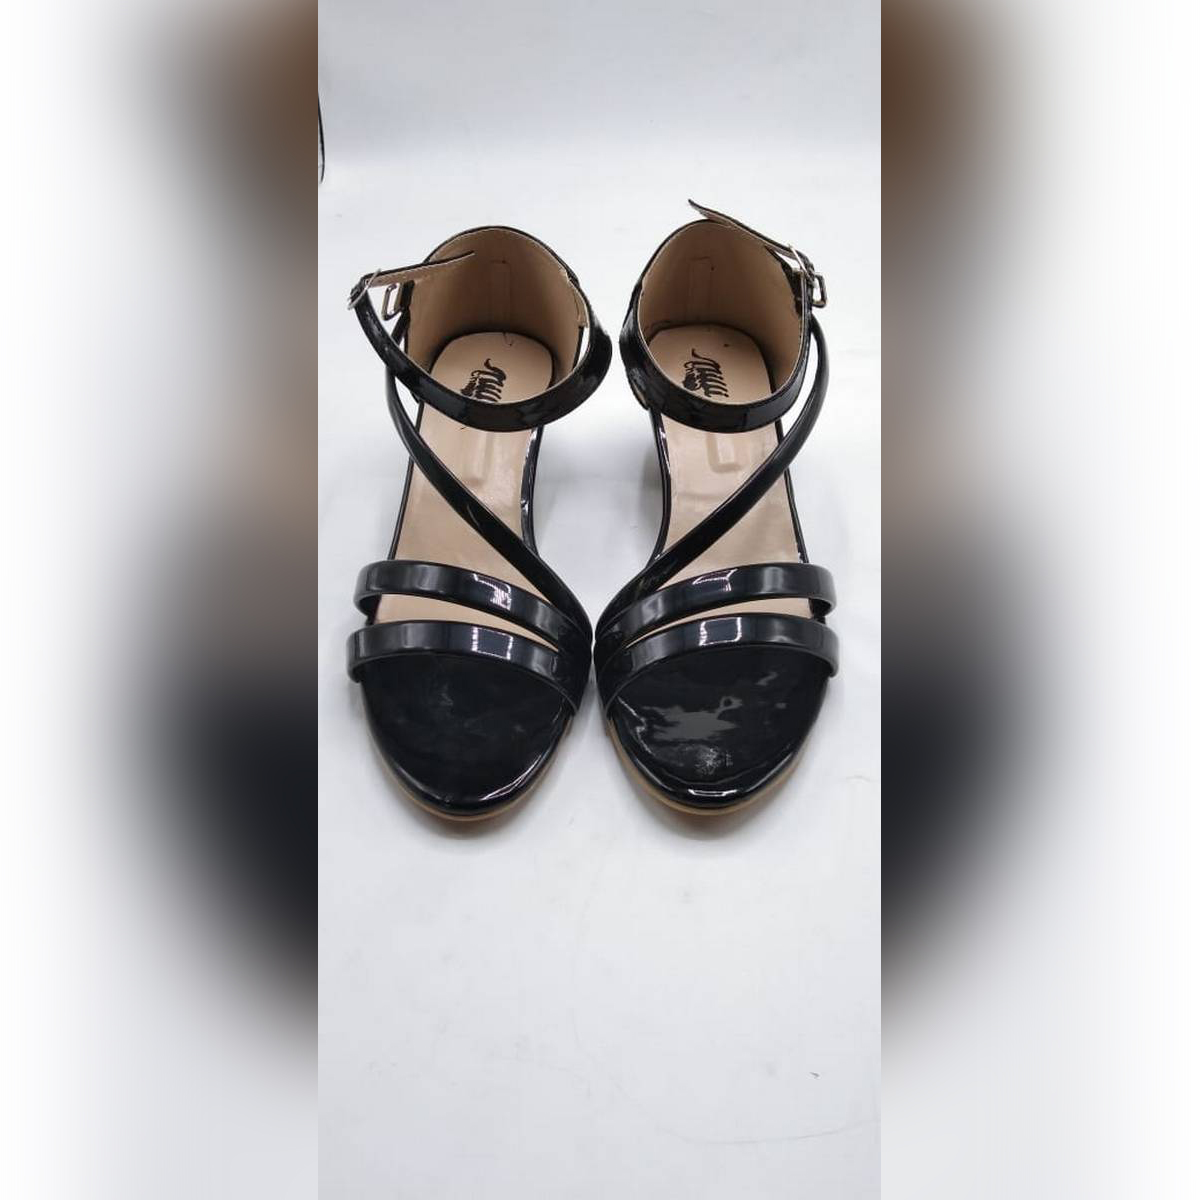 New Stylish Trending Women Heel sandal Exclusive Design of Turkish Wedge Sandals - 1.5 inches high